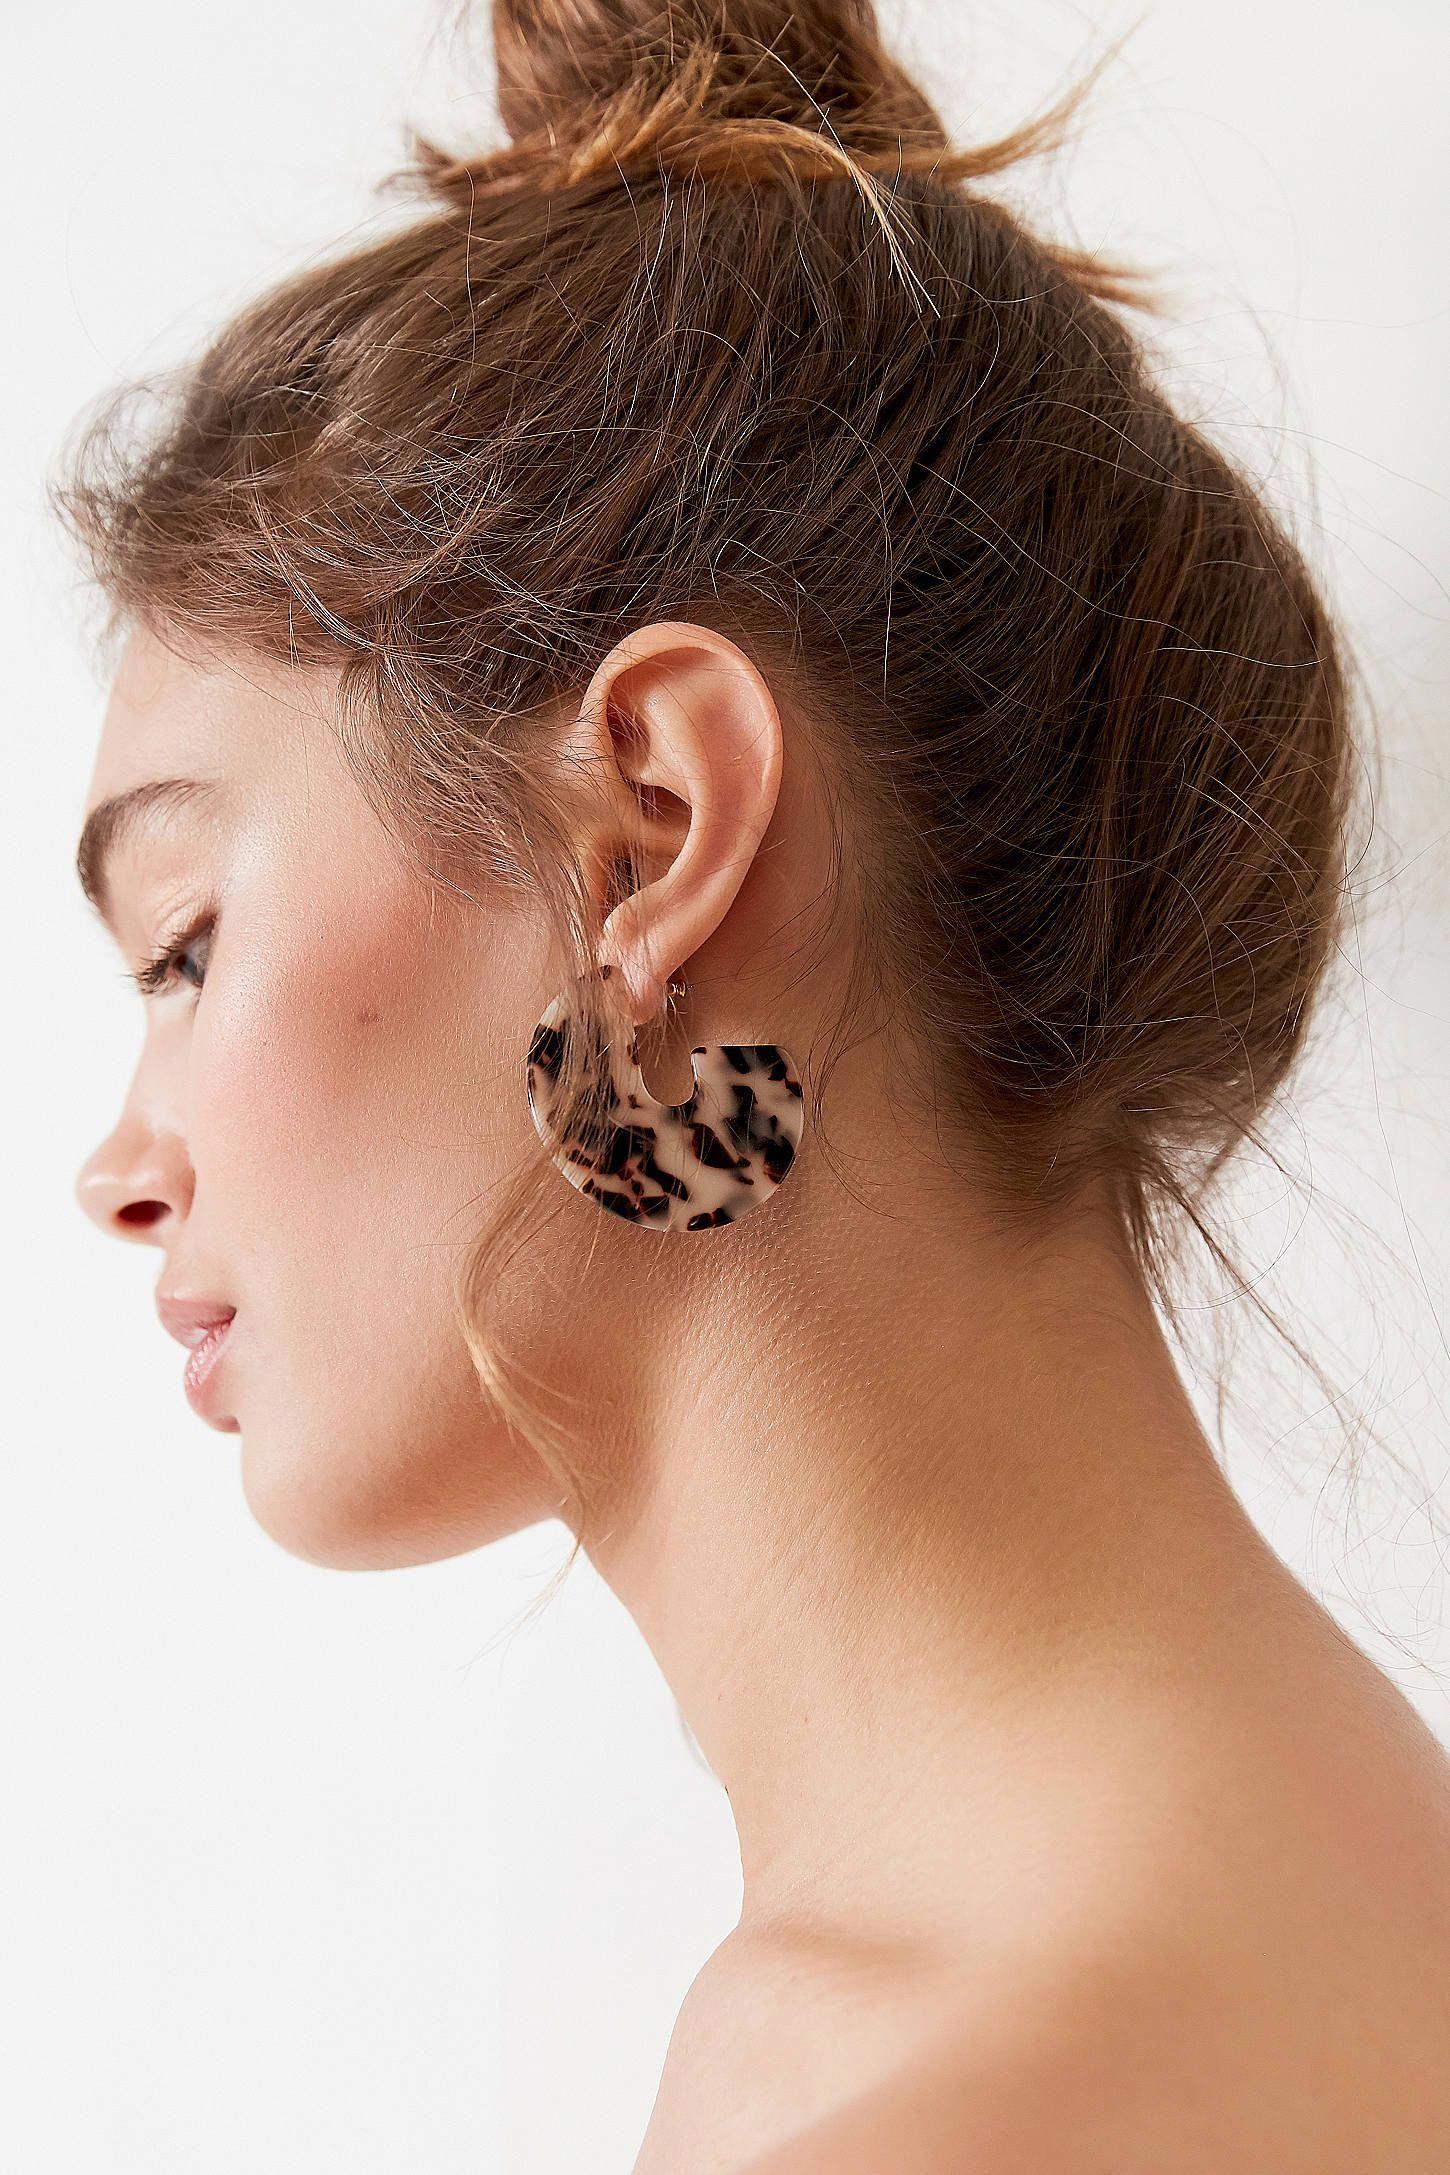 Nose piercing trends 2018  Tortoise Statement Hoop Earring  Urban Outfitters hoopearrings